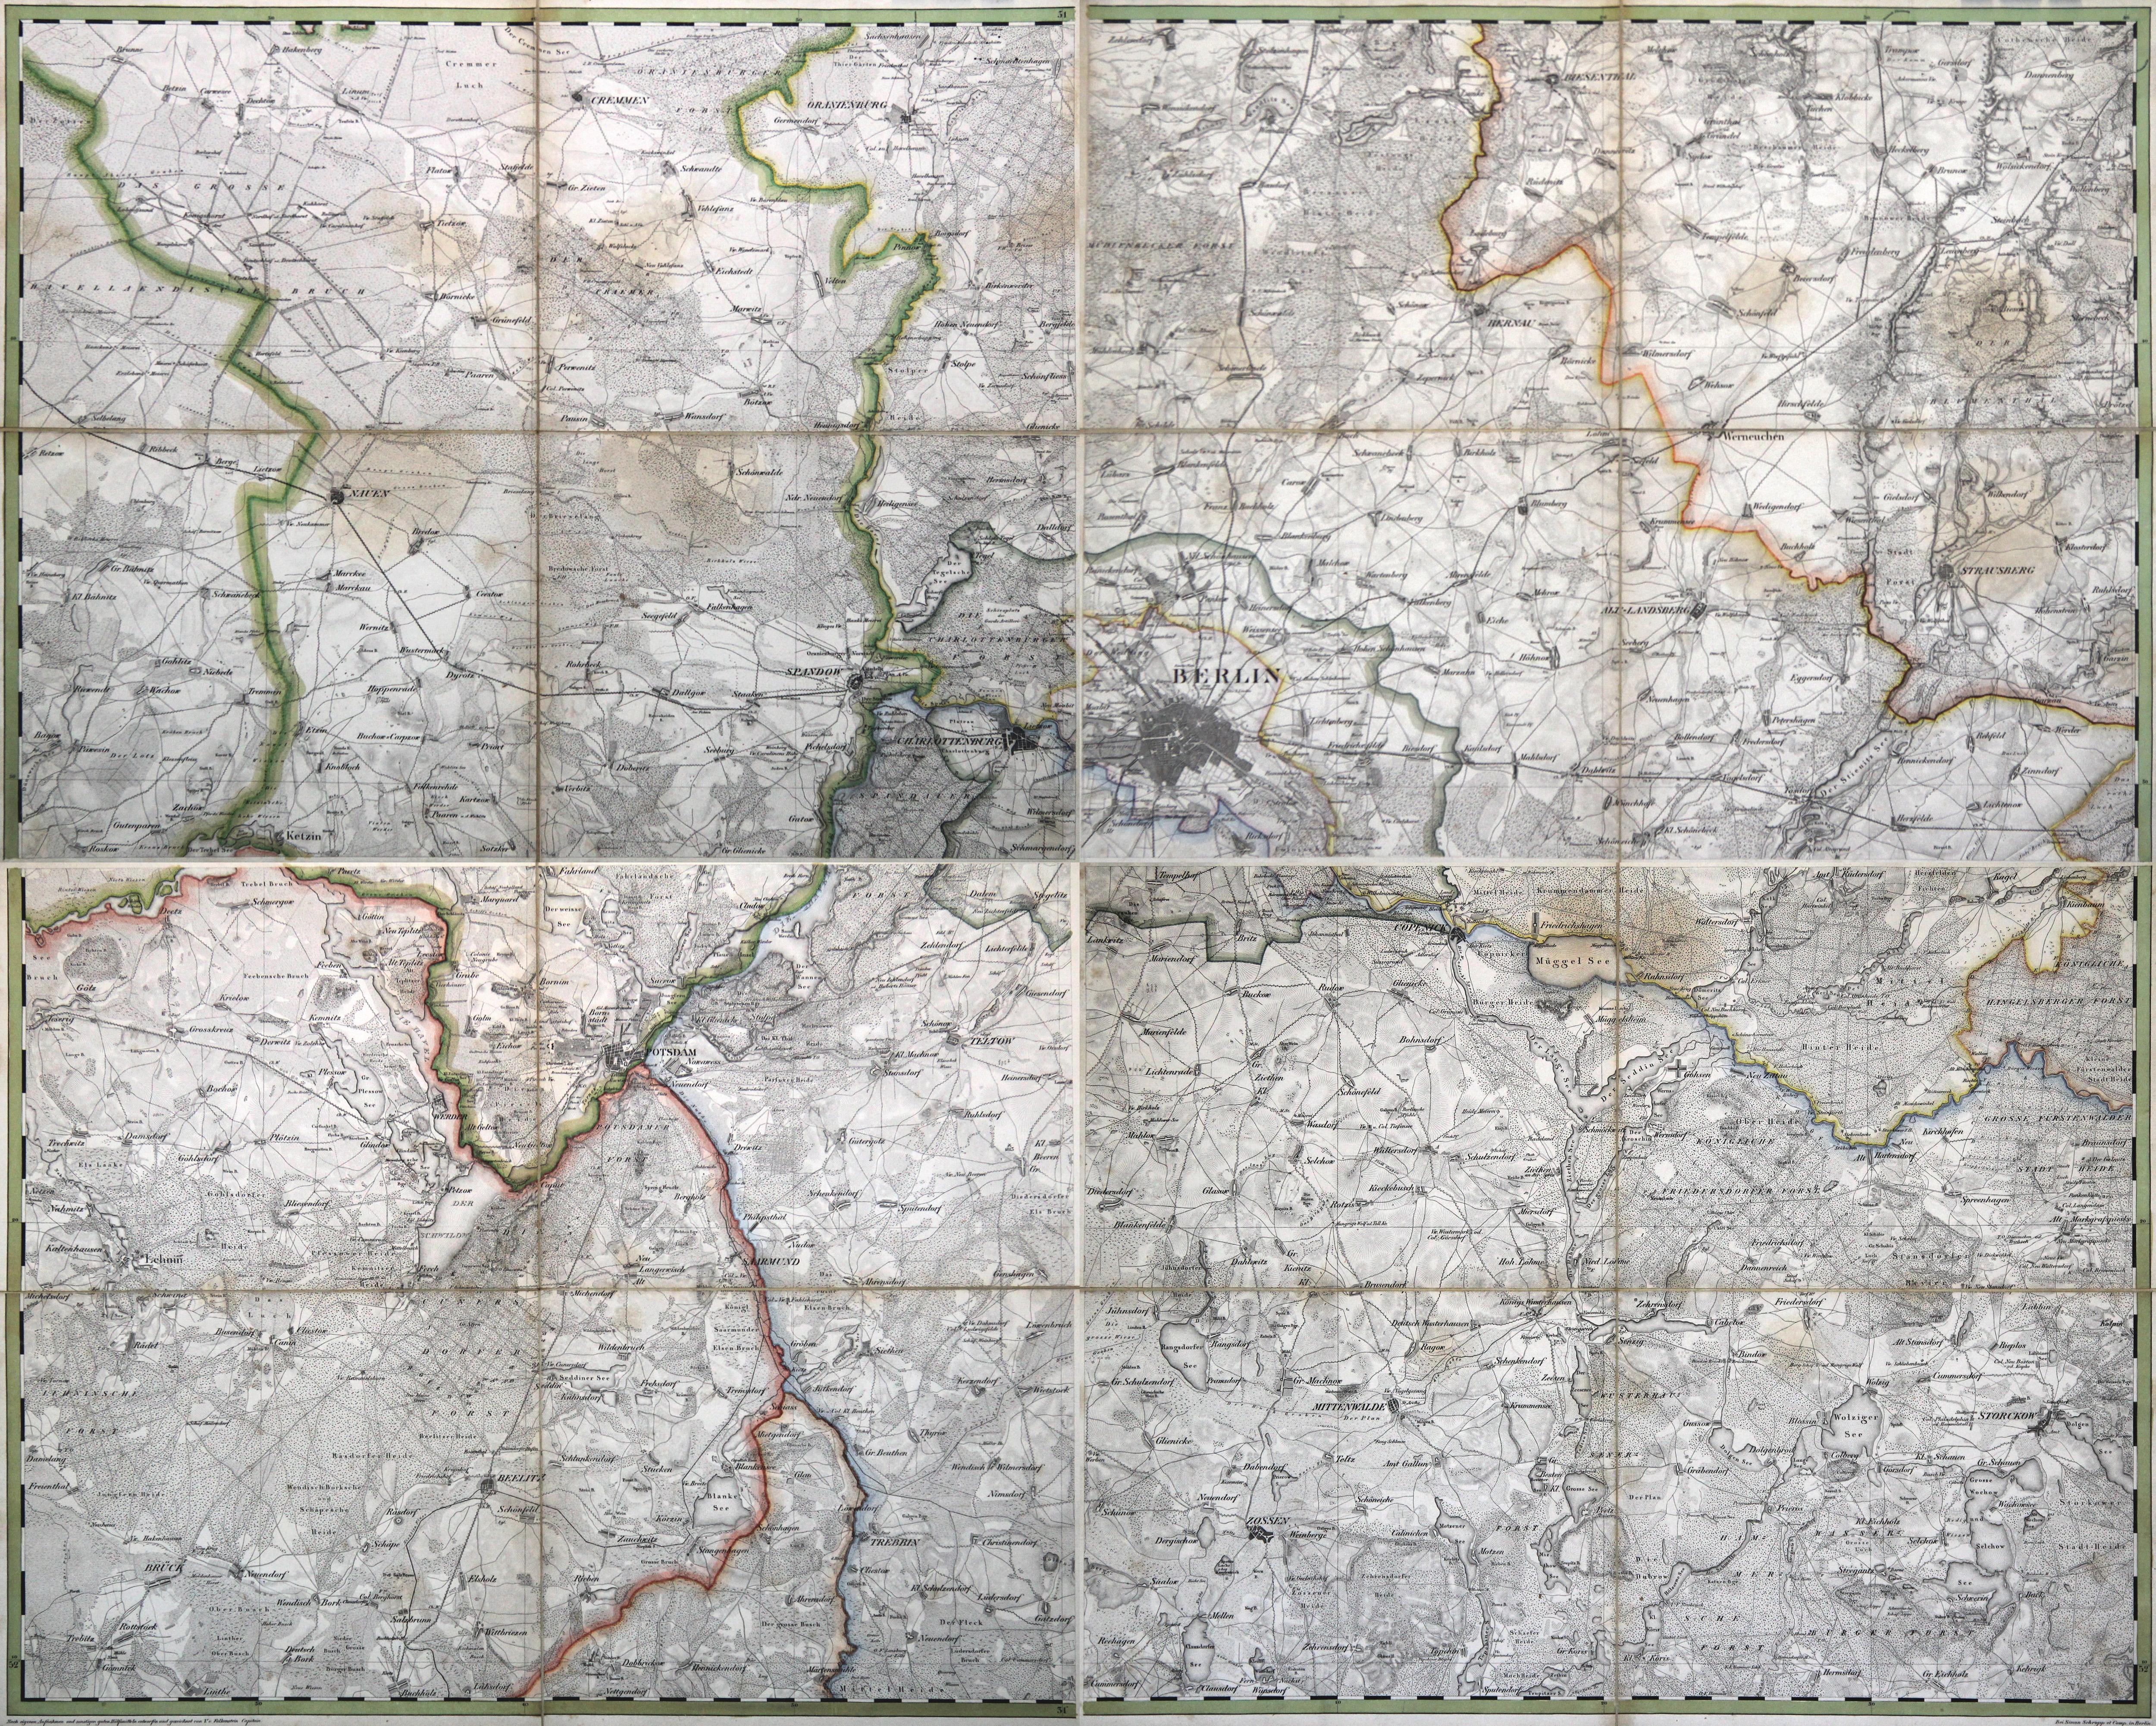 Manoever Plan der Gegend um Berlin.S R.: Berlin - Umgebungskarte: